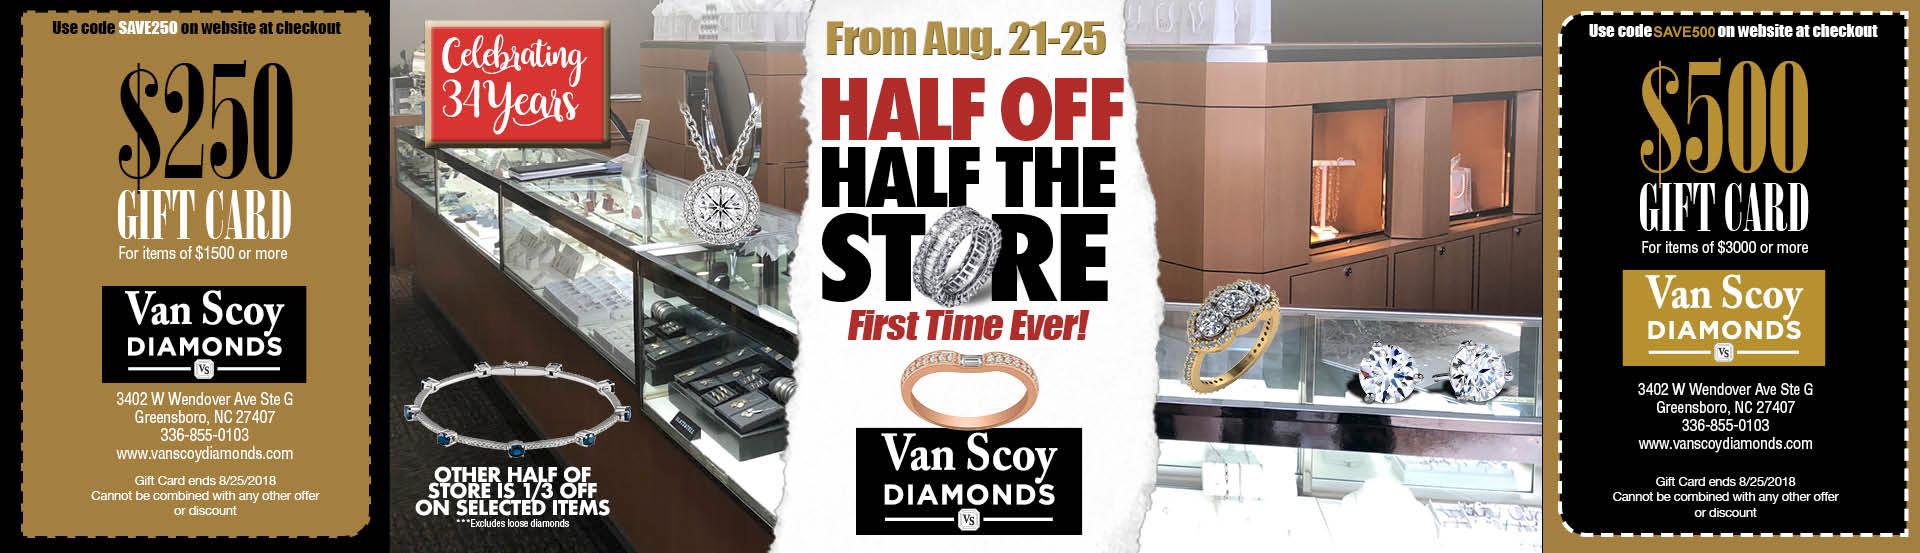 Half Off Half the Store